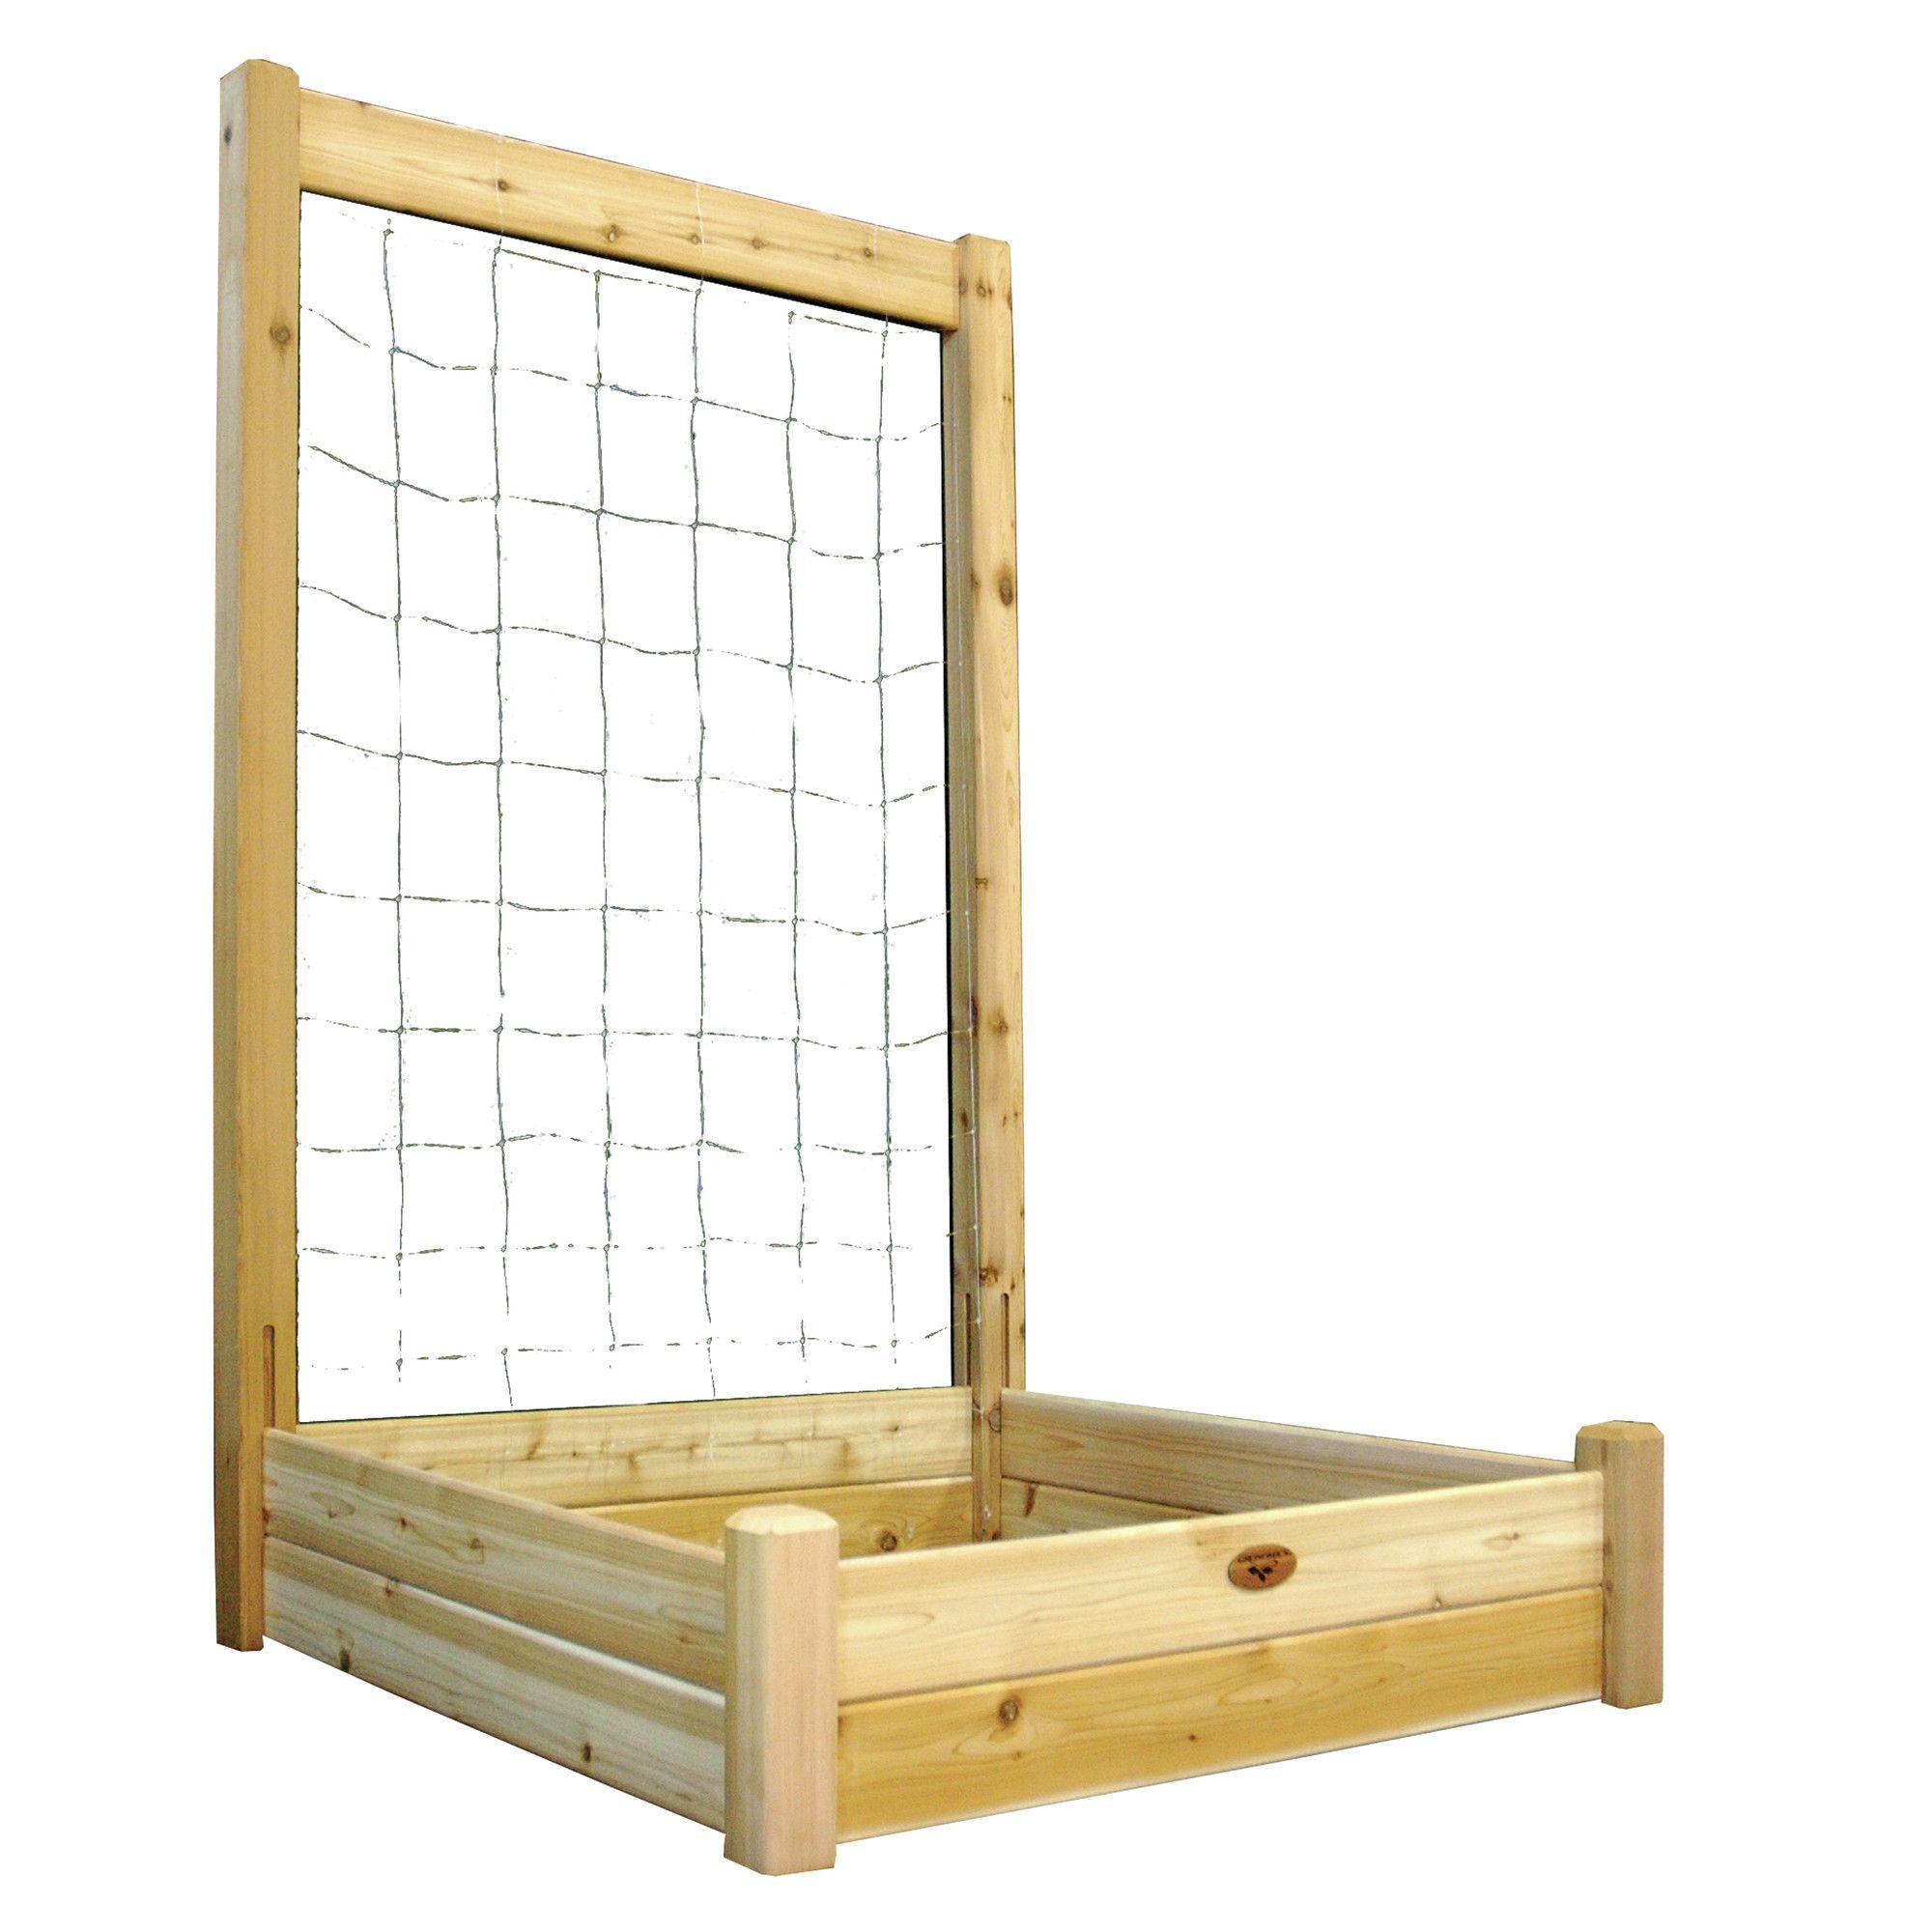 ana gronomics vermont raised cedar white bed medium gardens bedswhite garden beds build